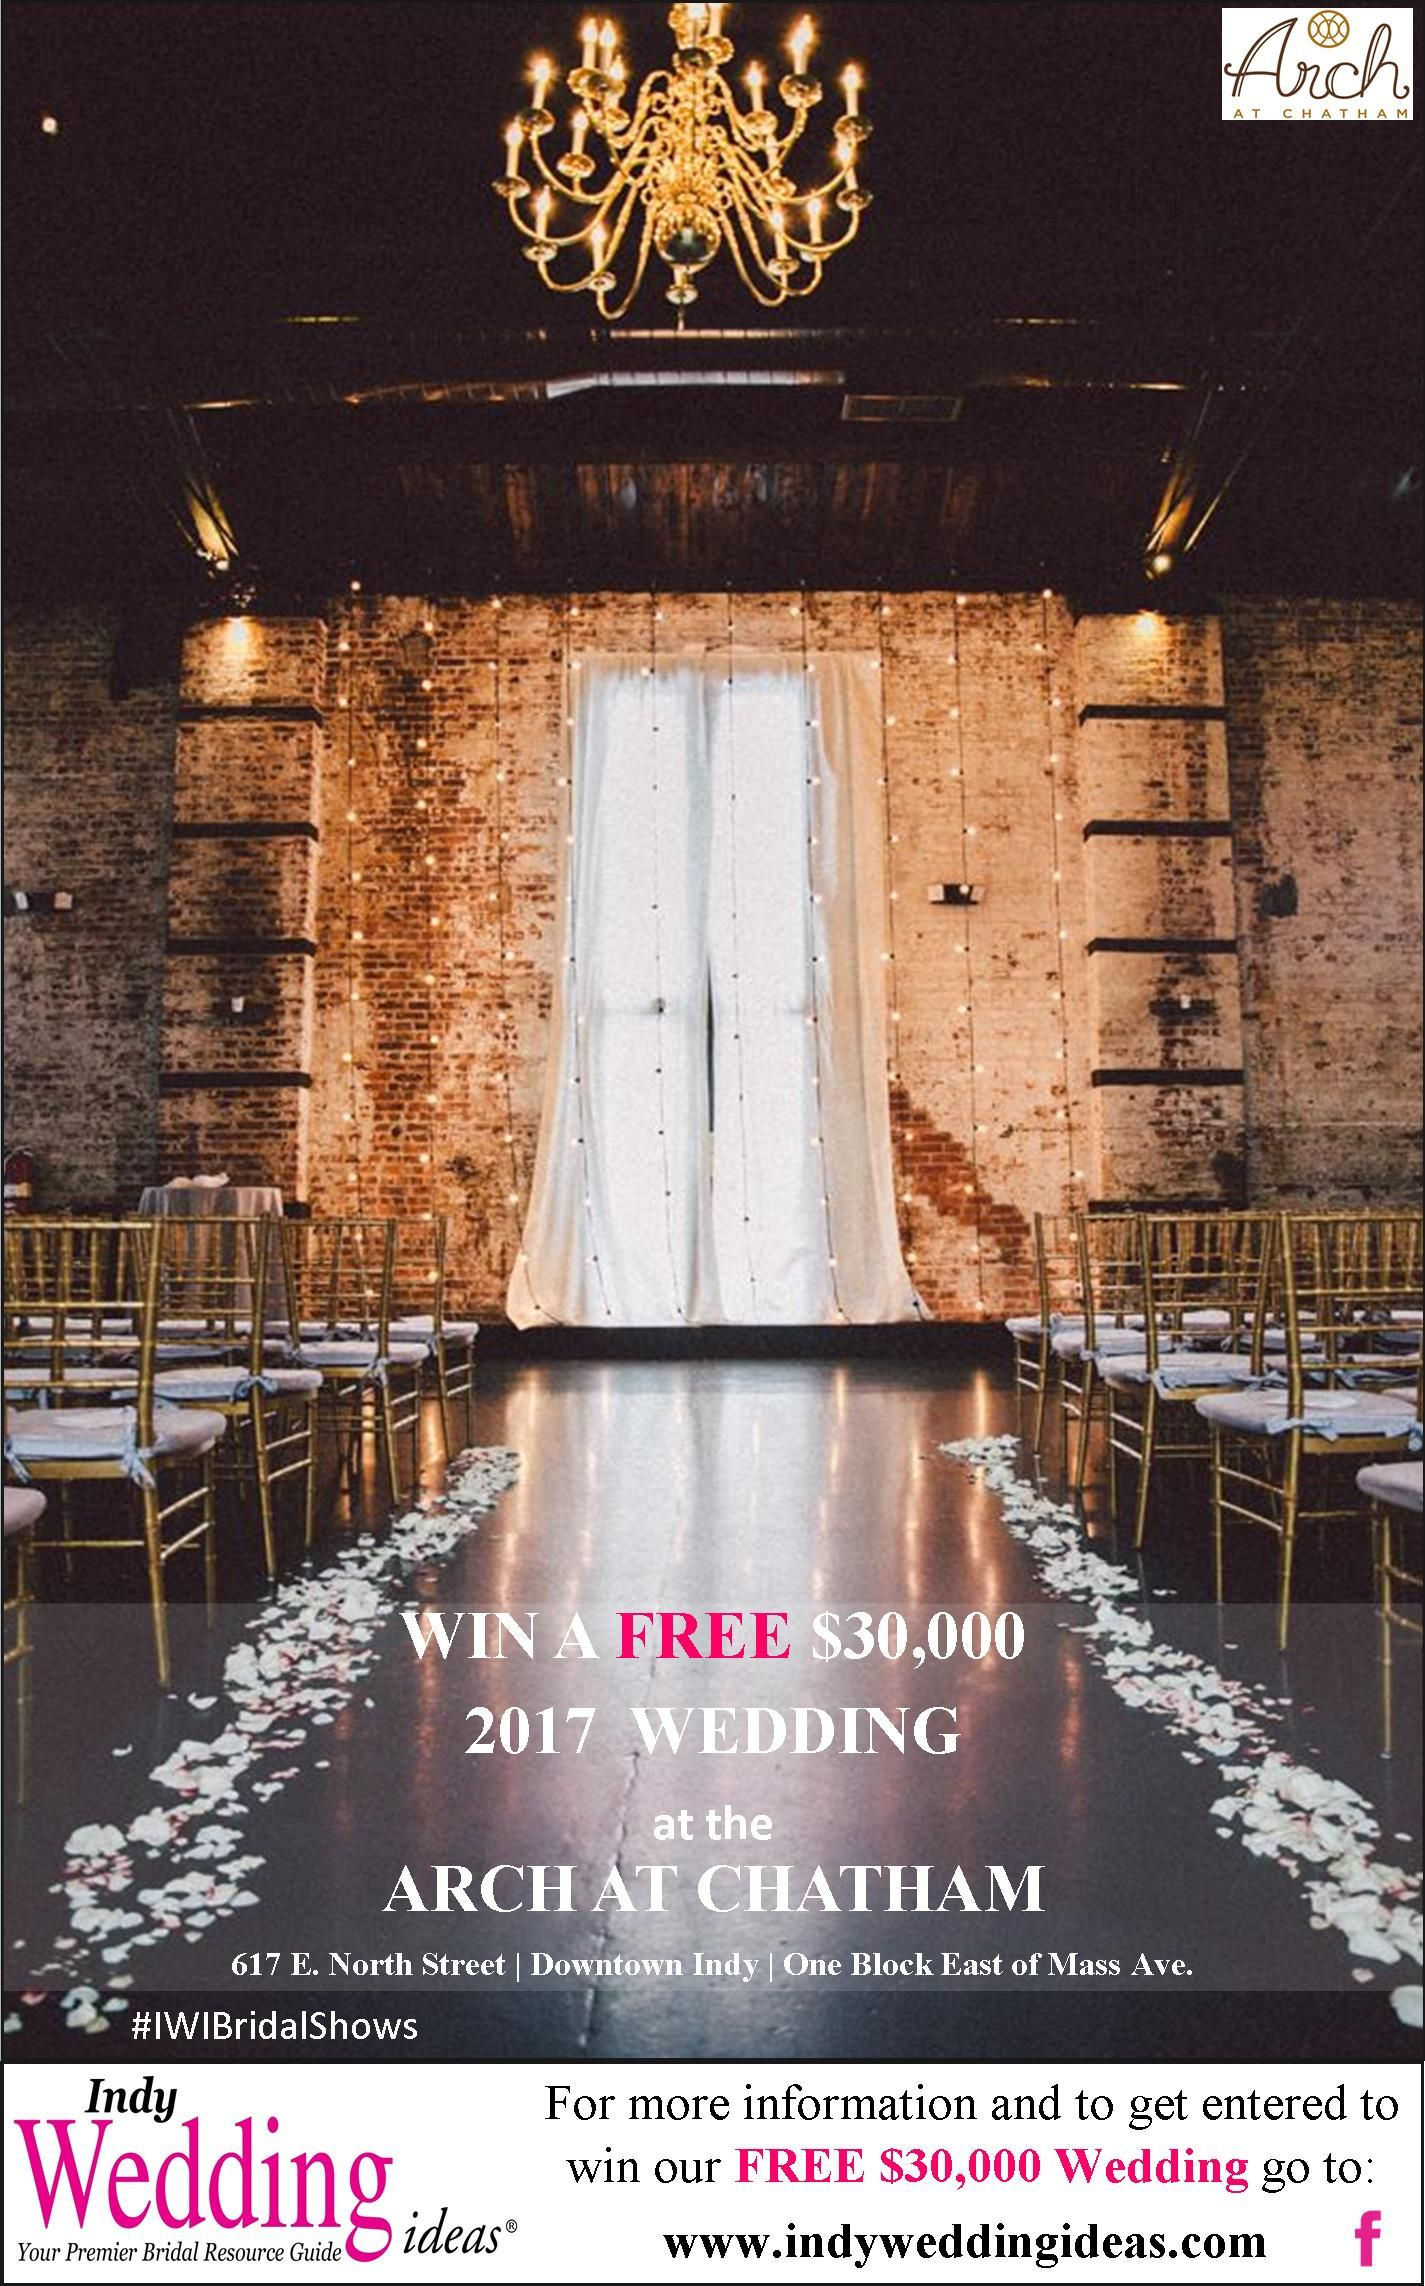 Free 2017 Dream Wedding Giveaway Get Entered At Www Indyweddingideas